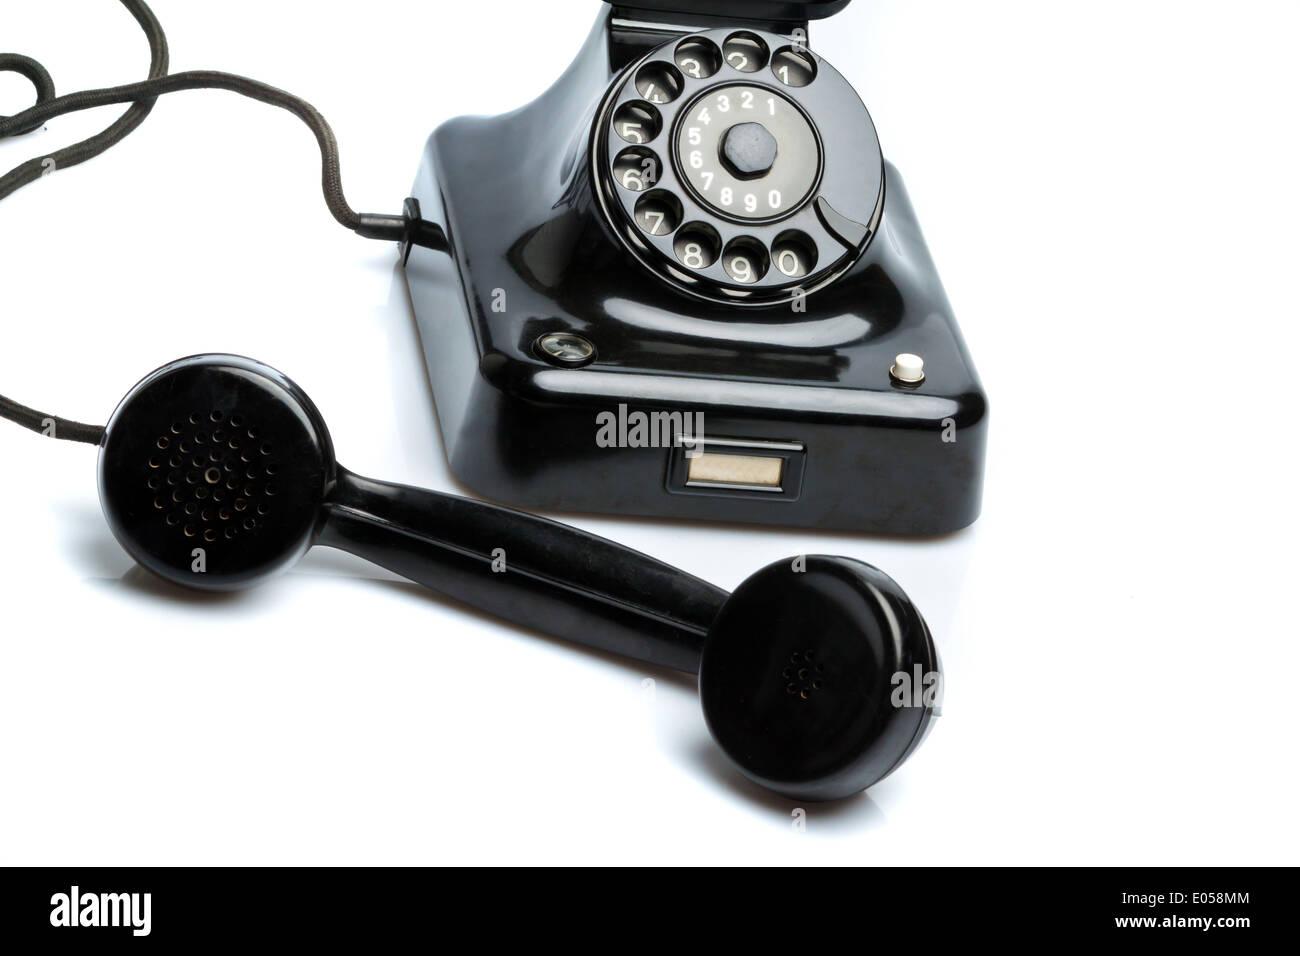 An antique, old fixed network telephone. Phone on white background., Ein antikes, altes Festnetz Telephon. Telefon auf weissem H - Stock Image